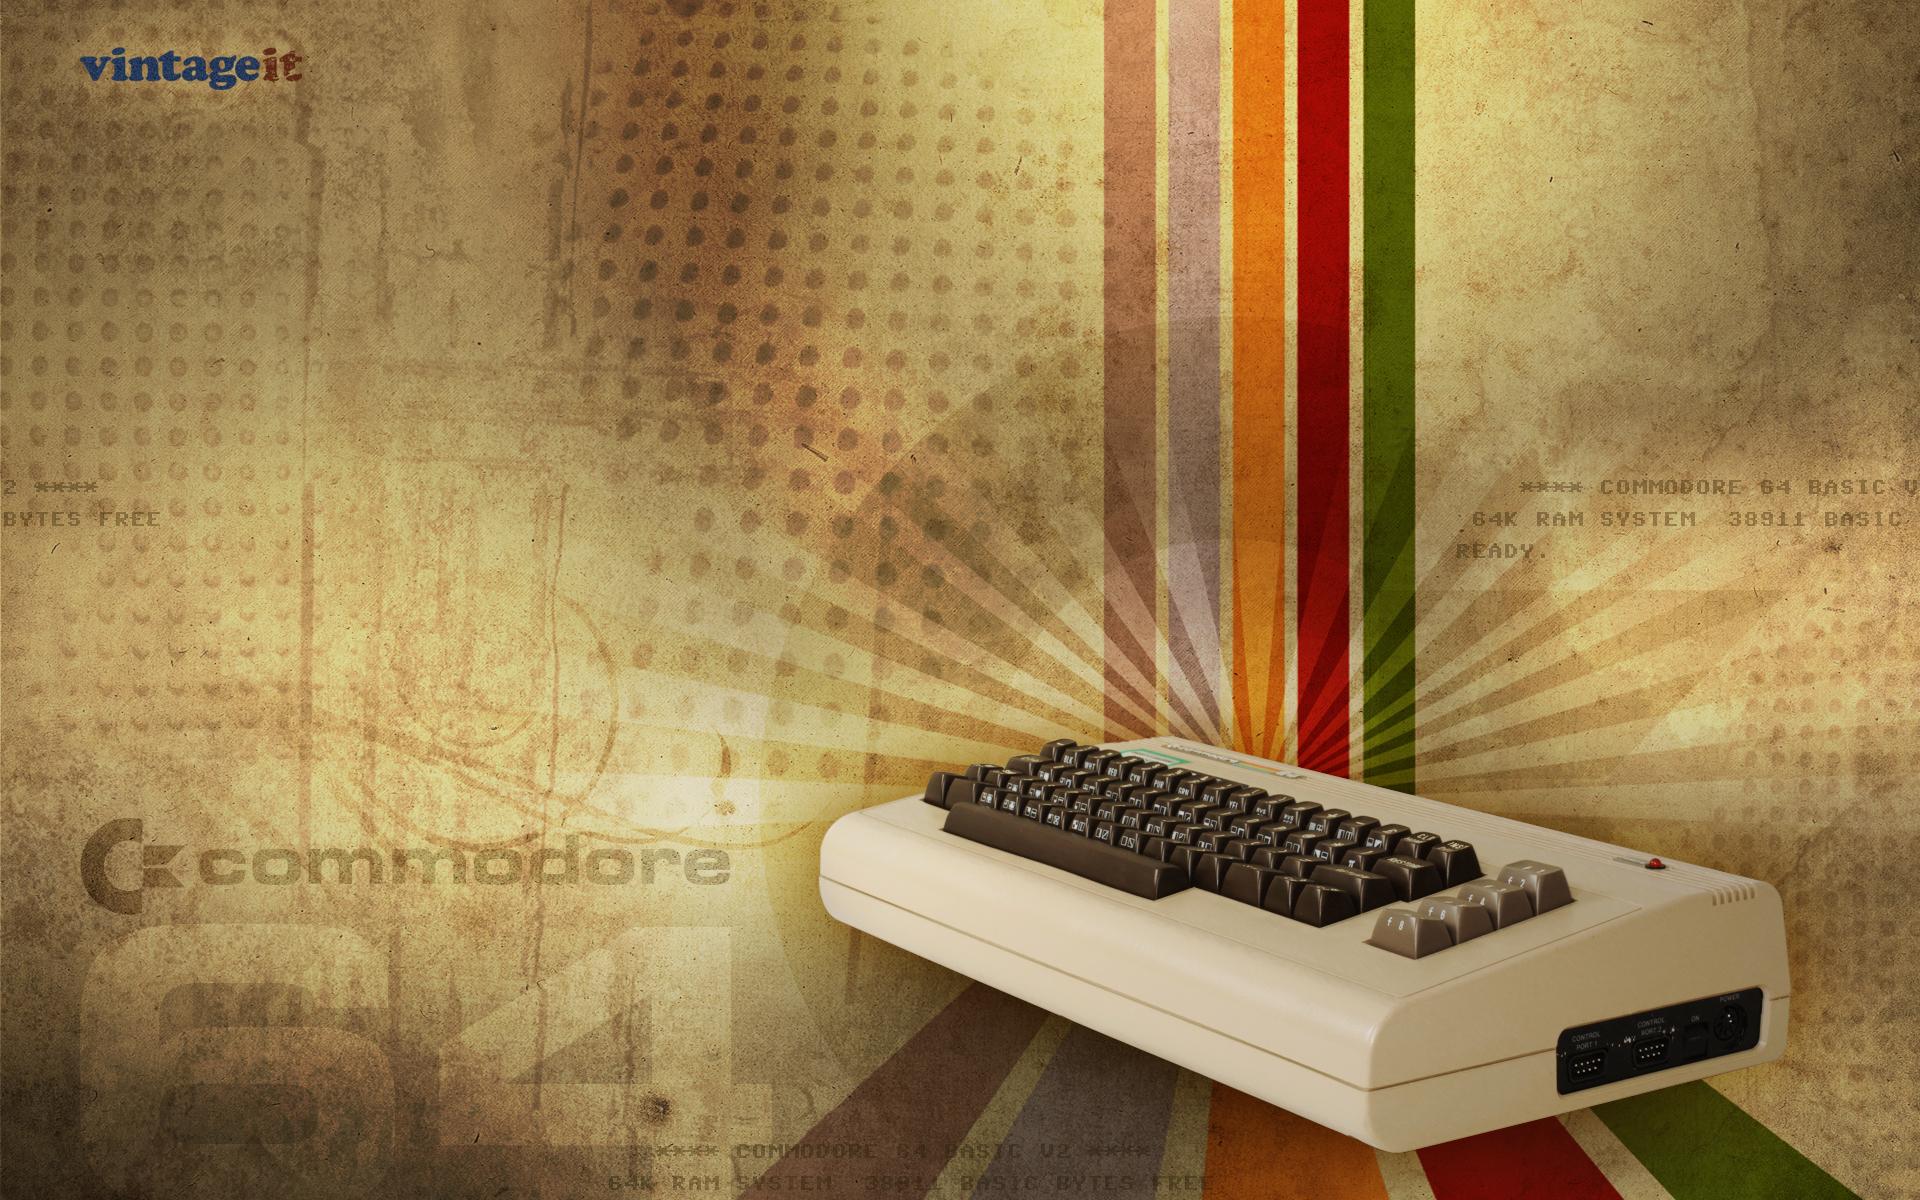 Commodore 64 vintage wallpaper   Desktop HD iPad iPhone 1920x1200